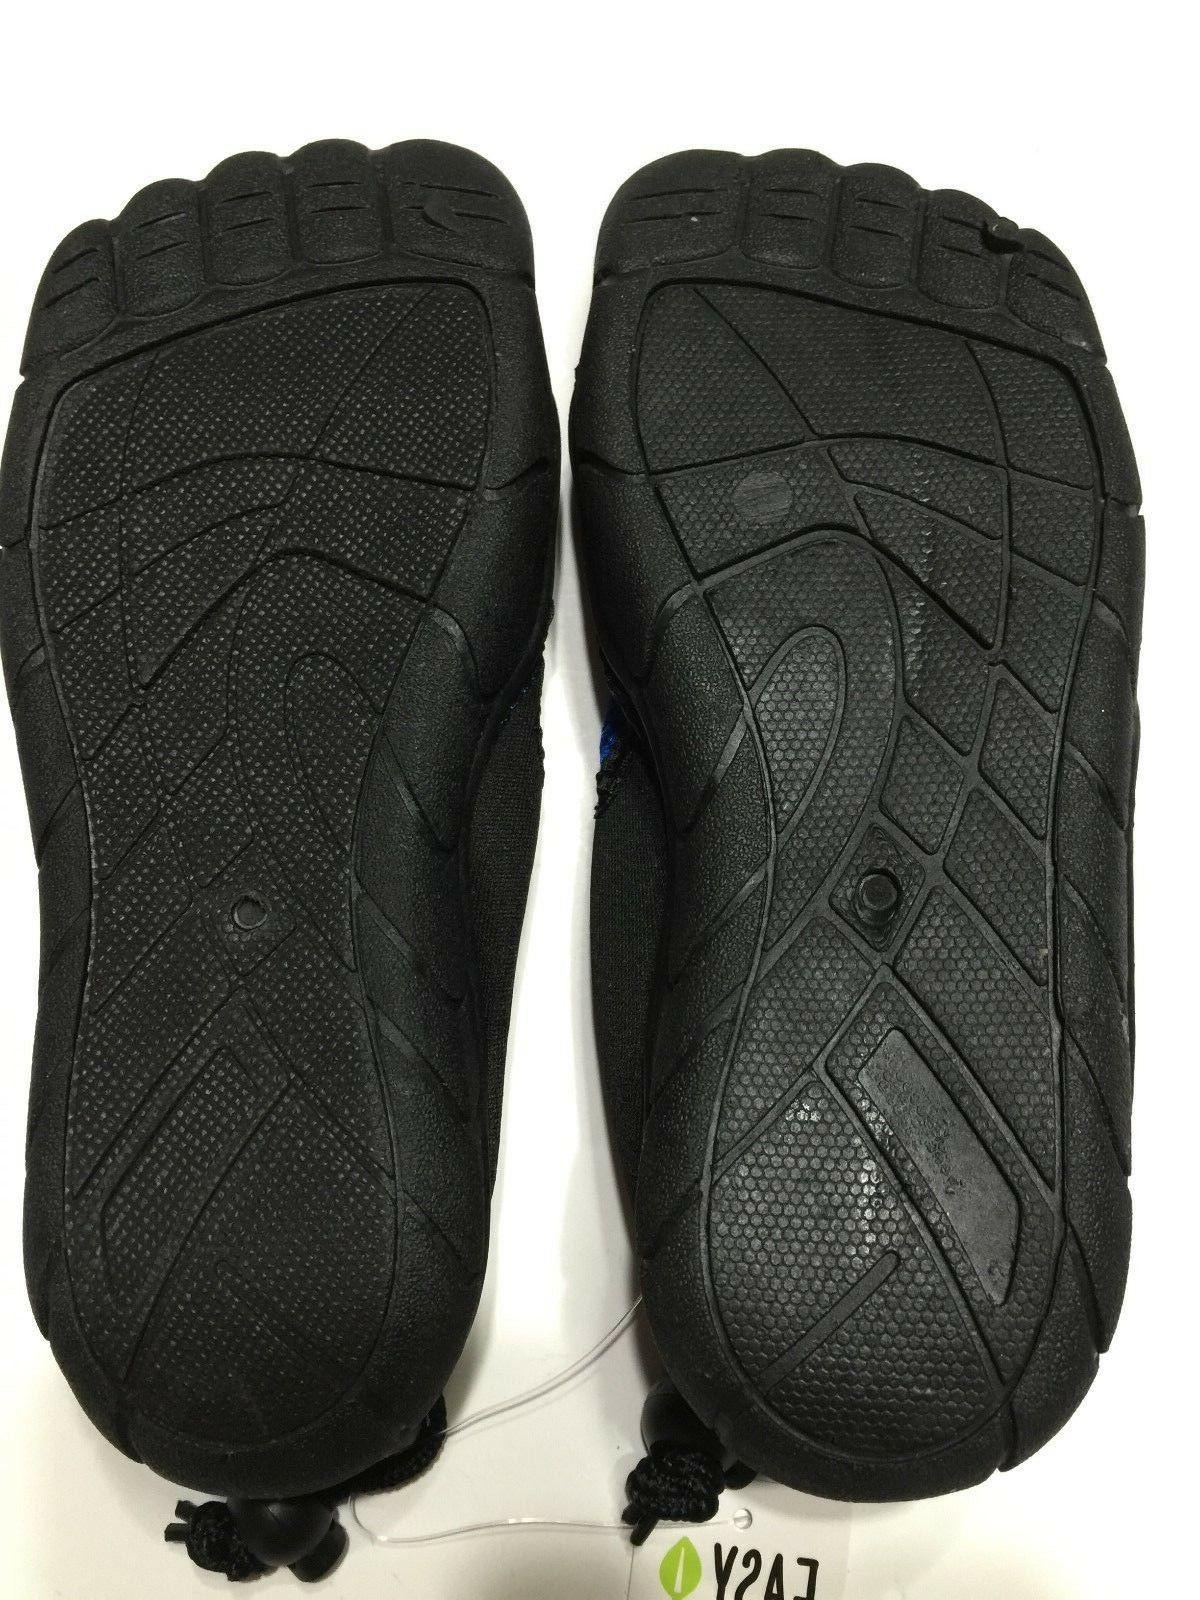 Men's Socks Snorkeling Sizes